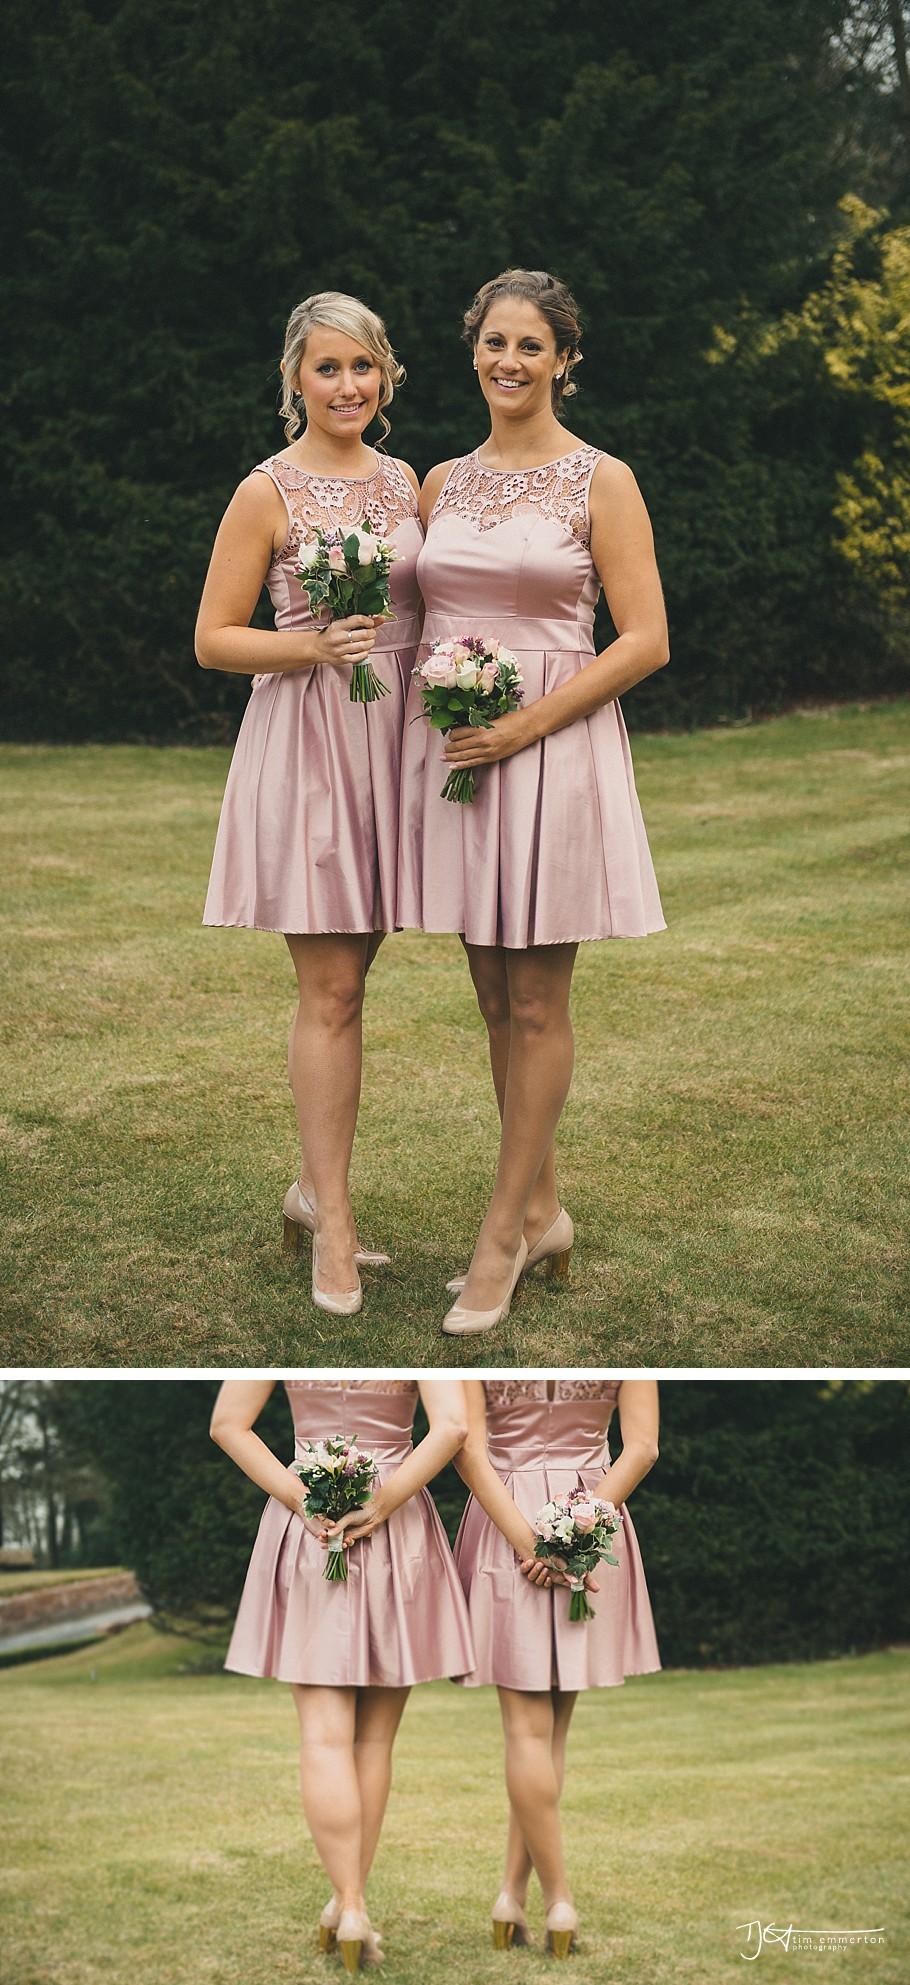 Samlesbury-Hall-Wedding-Photographer-167.jpg